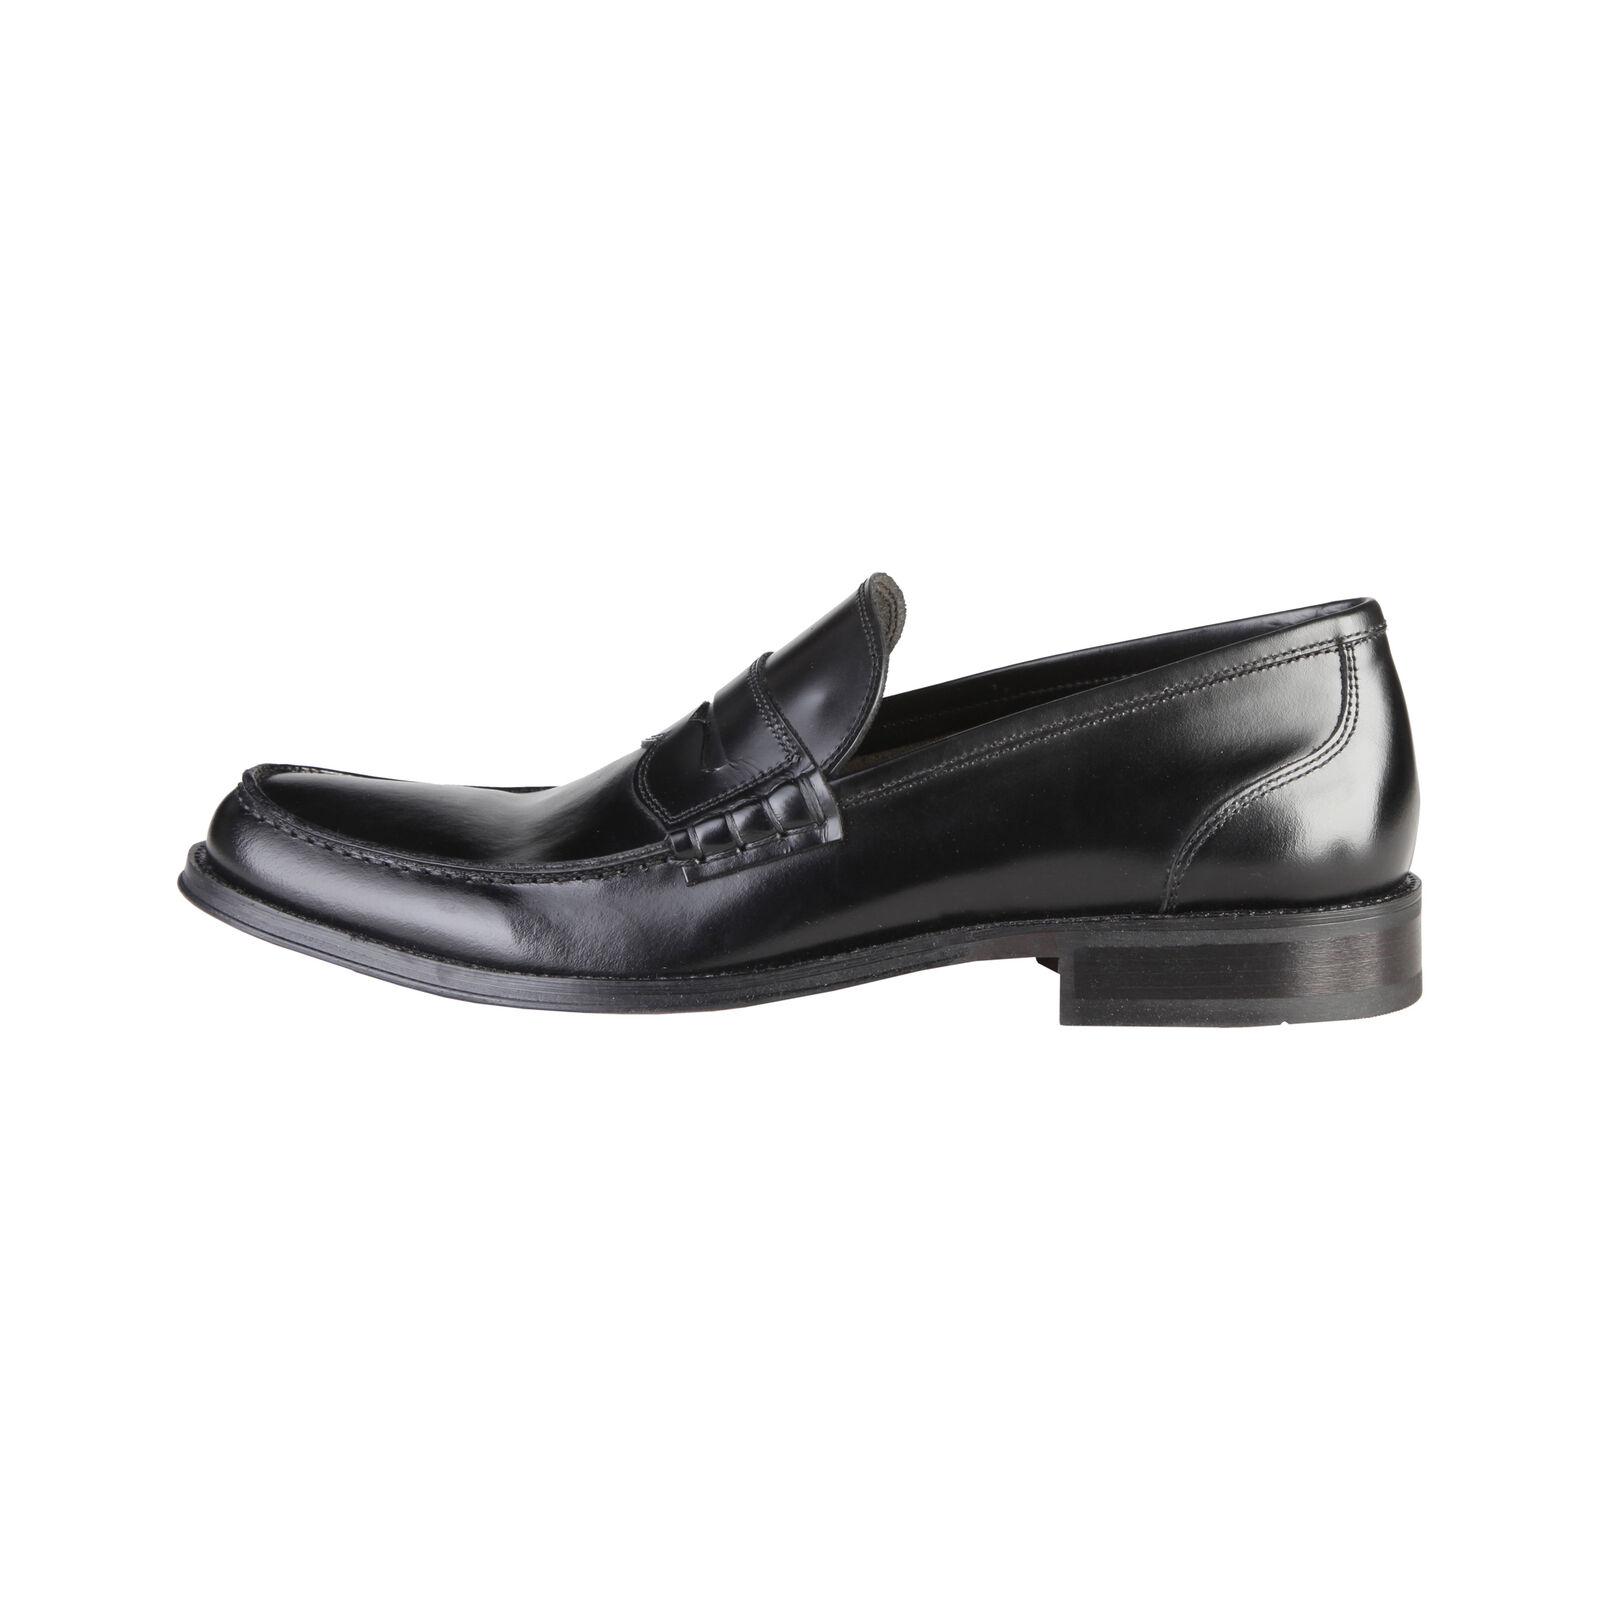 Made in Italia Herren Schuhe Klassische Mokassins Slipper Schwarz Leder